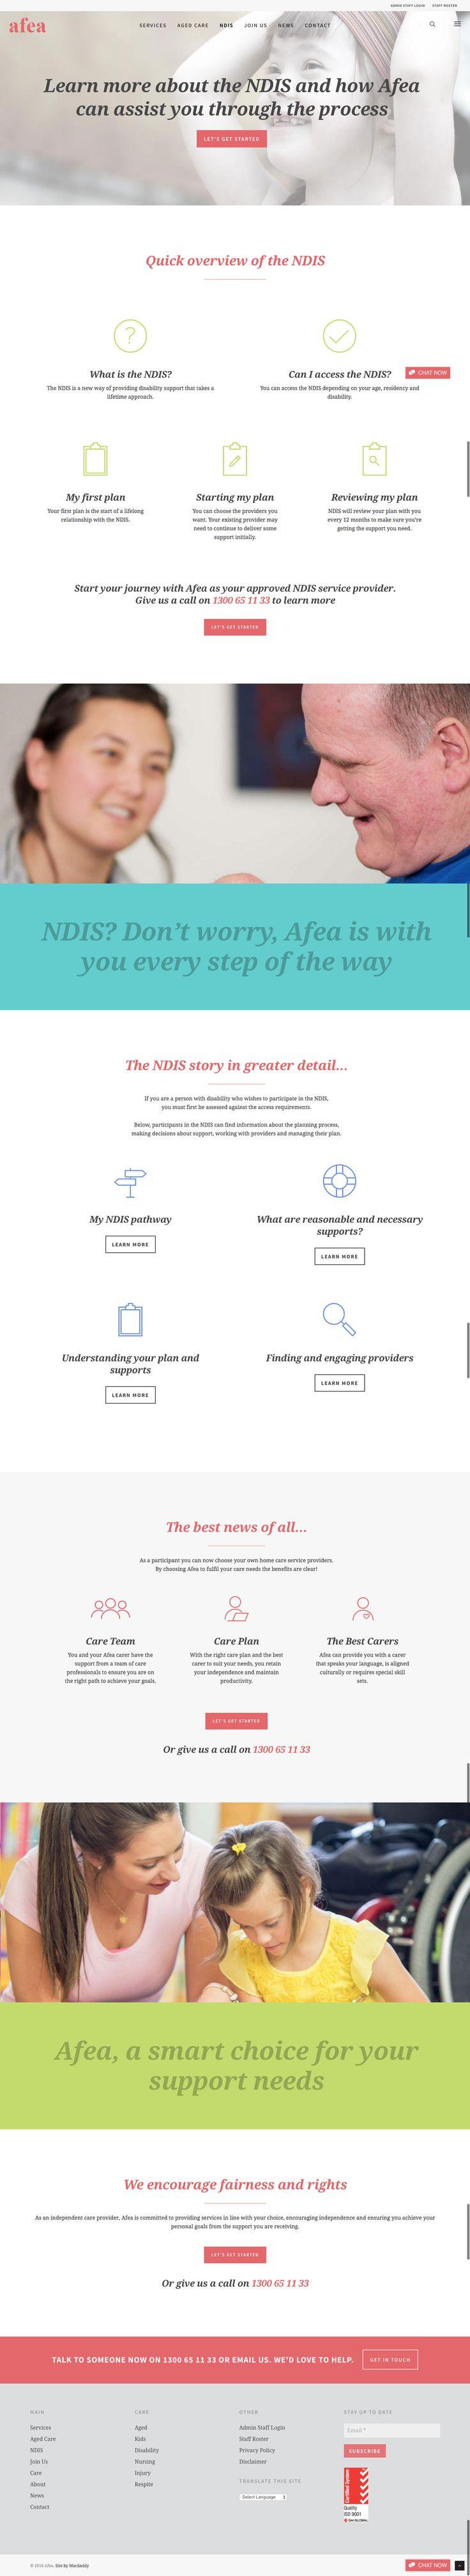 New responsive responsive website by KORE (http://kore.digital/). Disability page. #responsivedesign #webdesign #wordpress